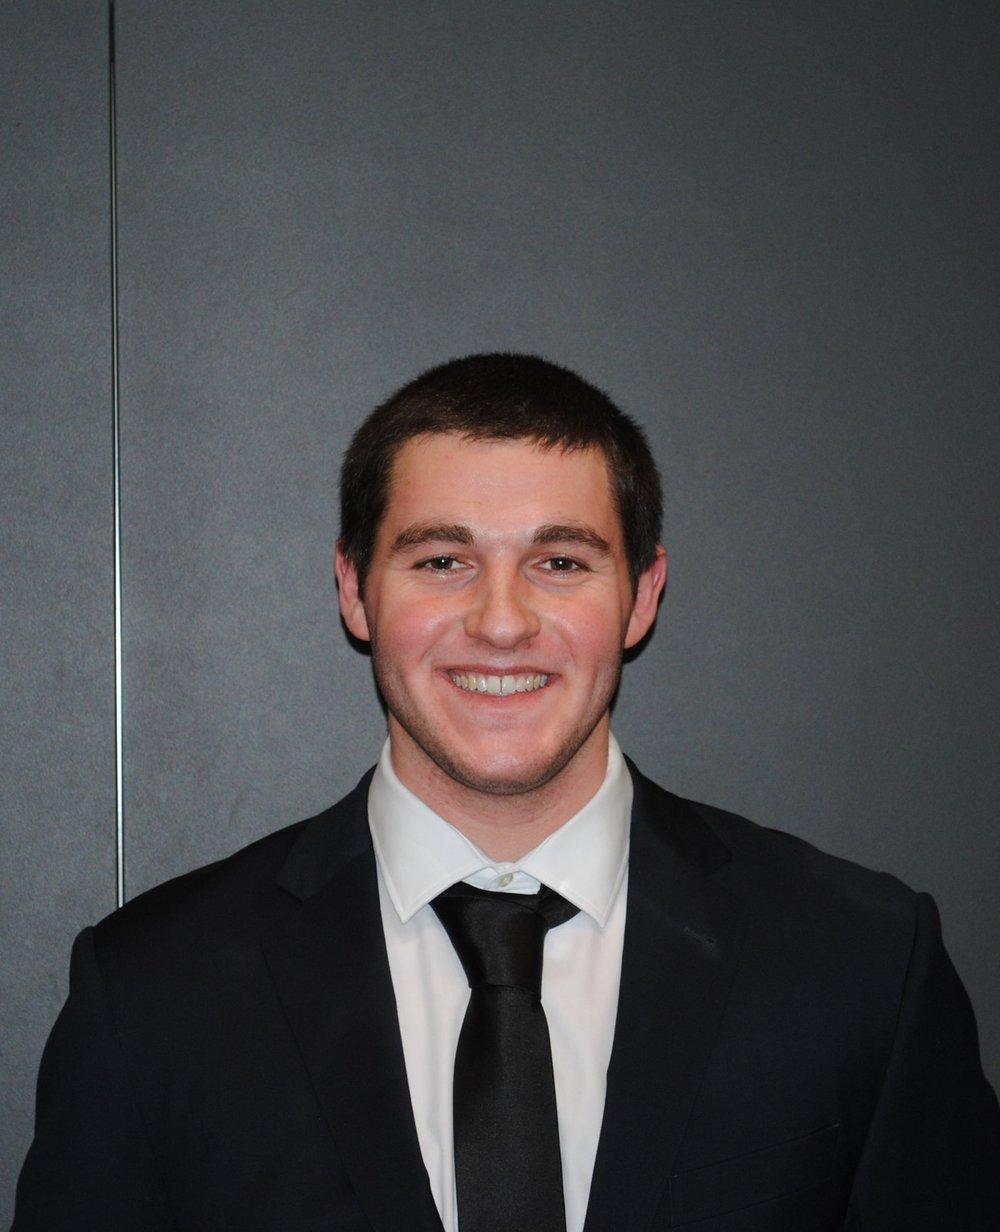 Jacob Moeckler, PLedge class of 2016